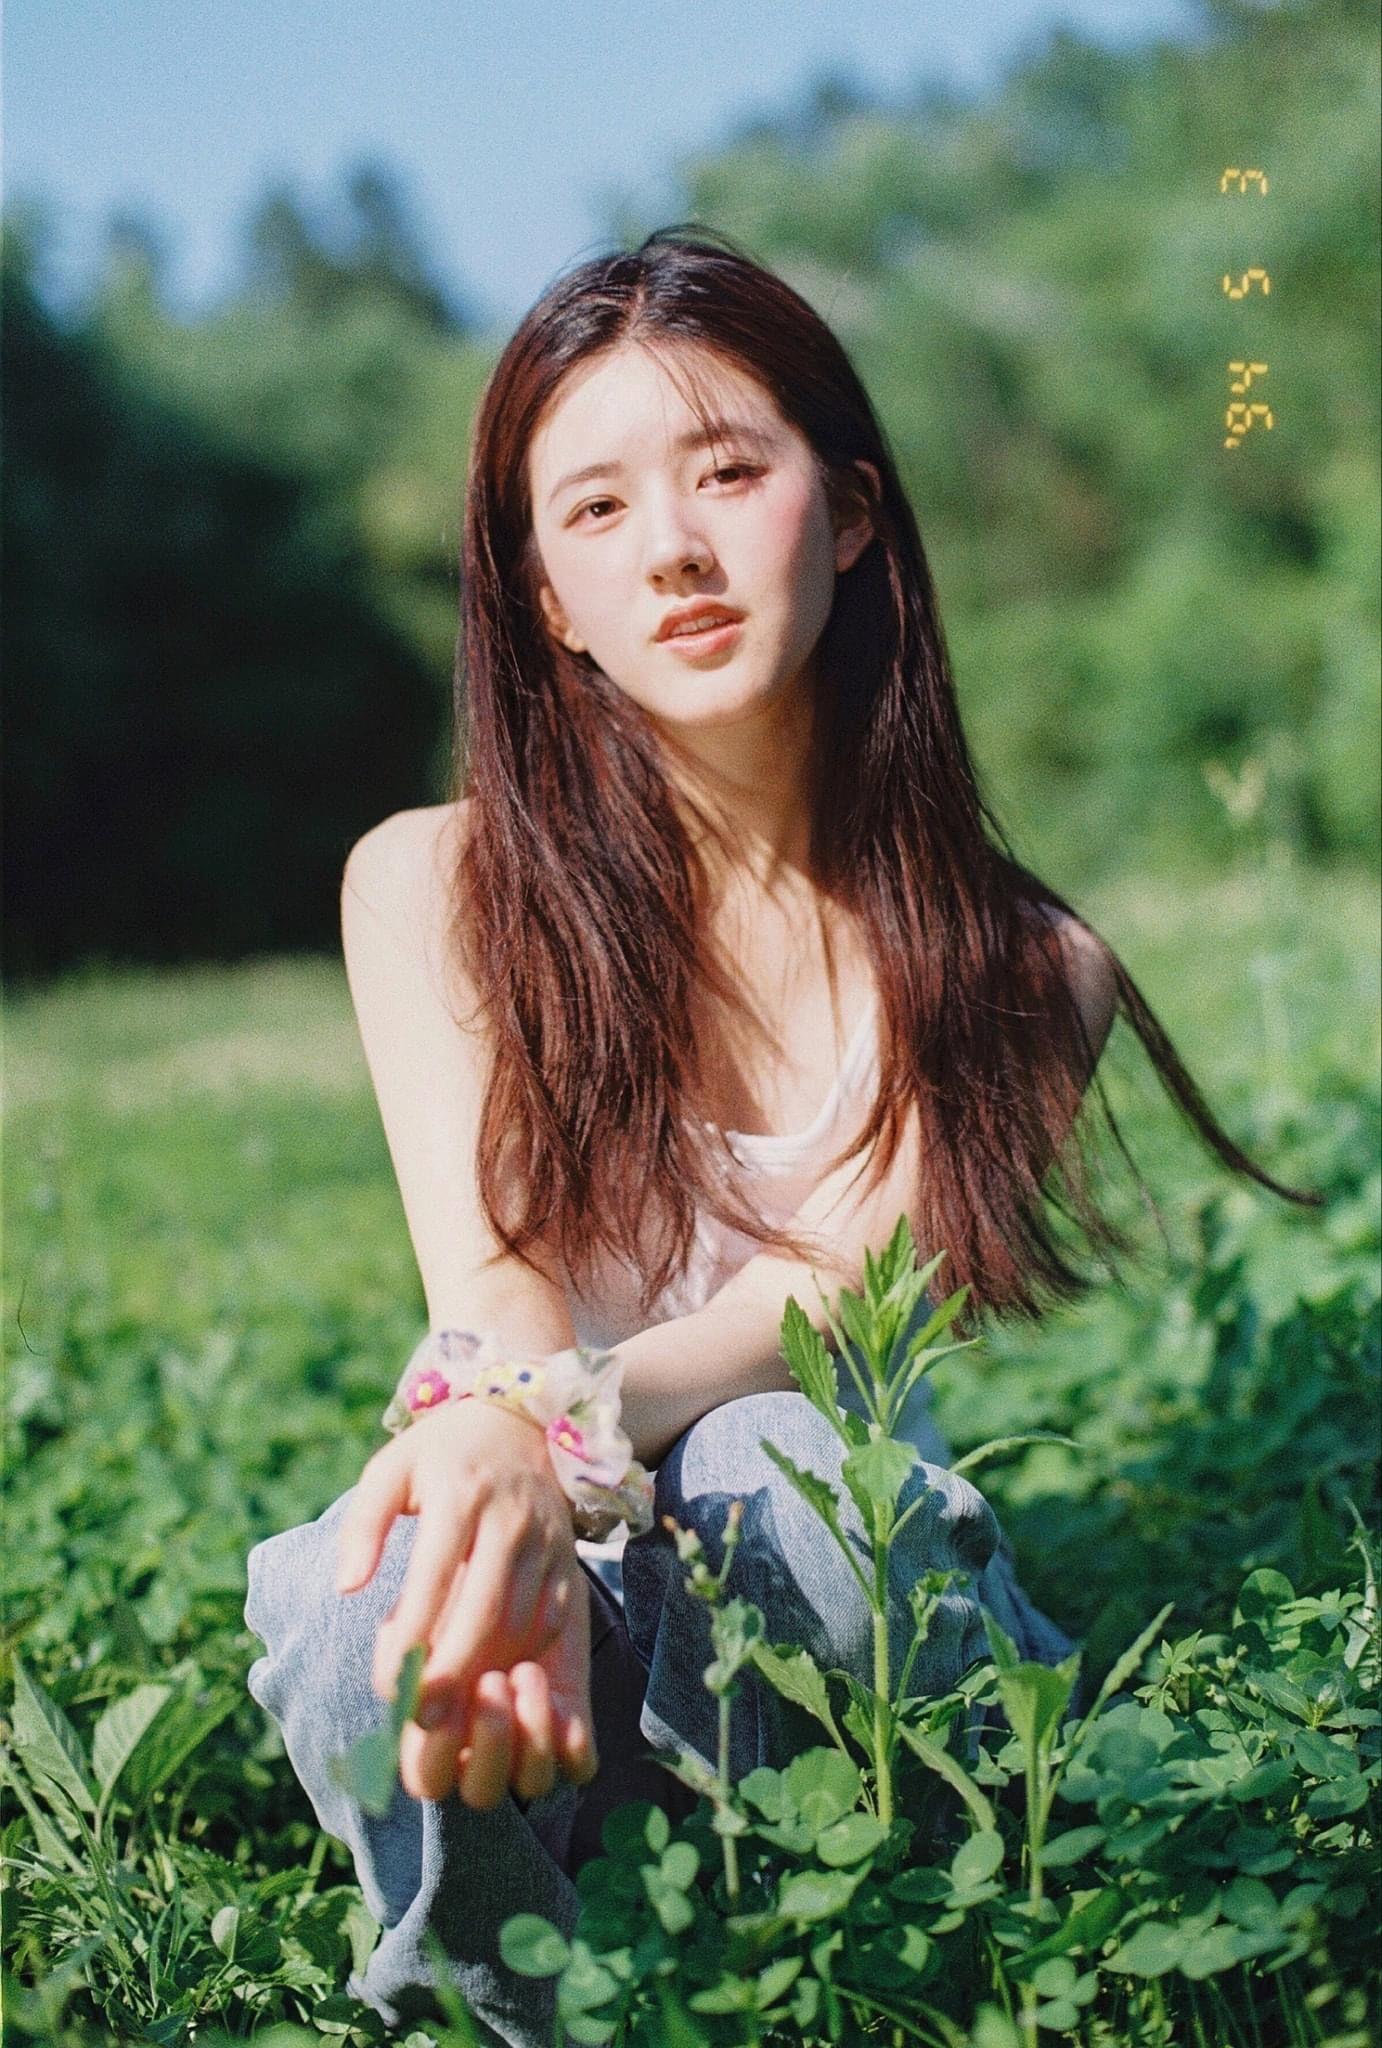 On january 12, 2019, she won the annual network potential actor award. ปักพินโดย Kil ใน 赵露思 - Zhao Lusi   คนดัง, ผู้หญิง, นักแสดงหญิง